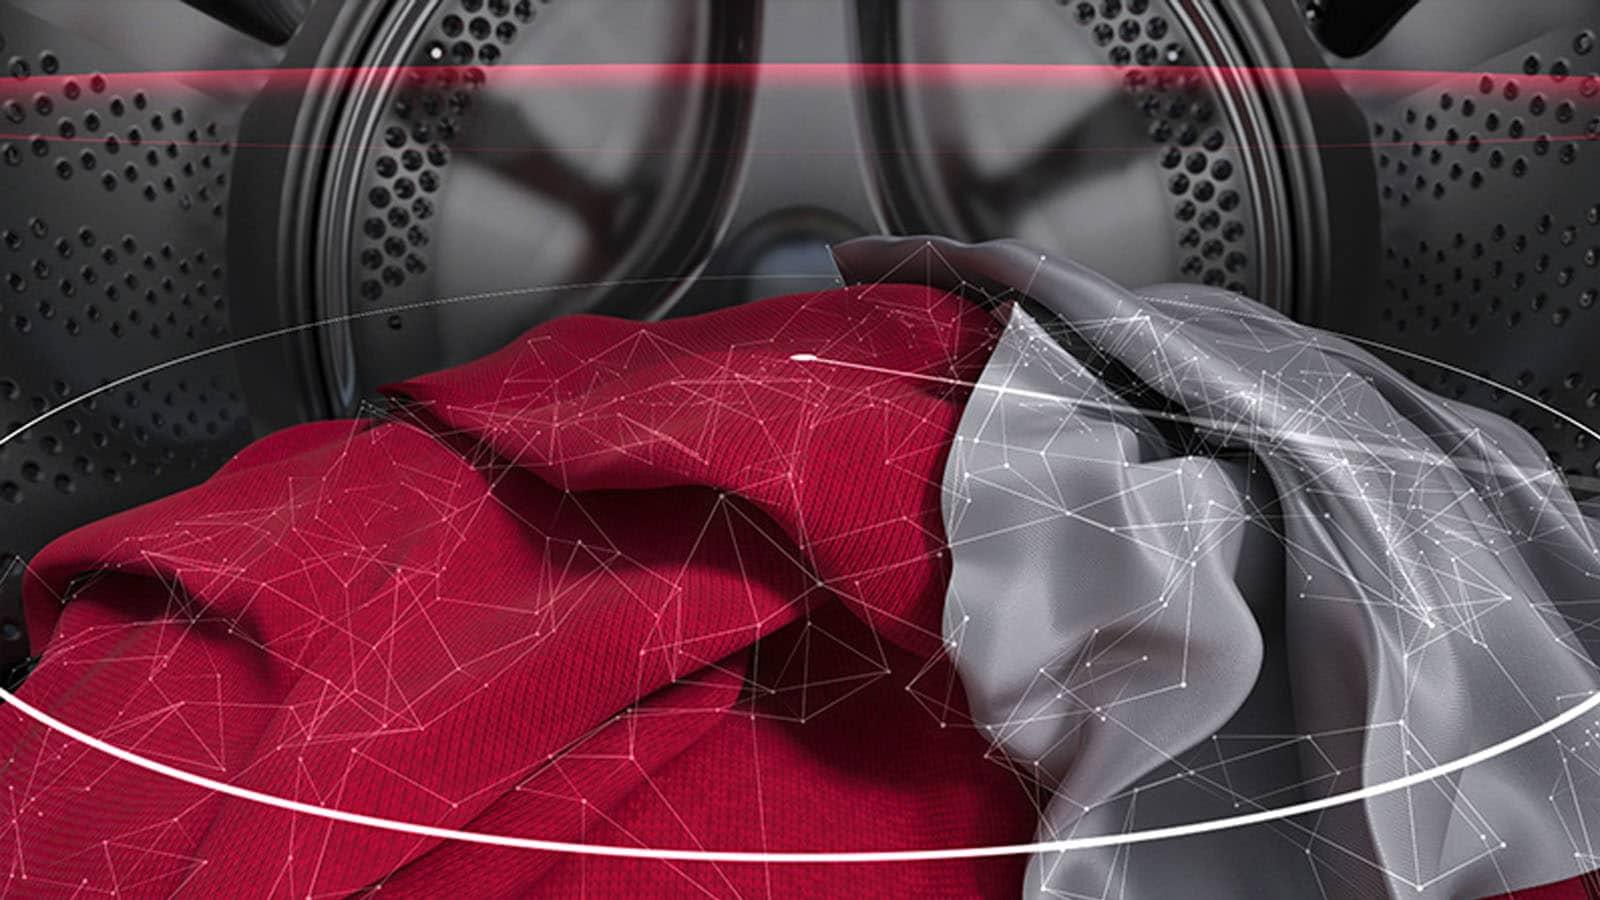 Hoover H-WASH Washing Machine 500 31010333 (3)